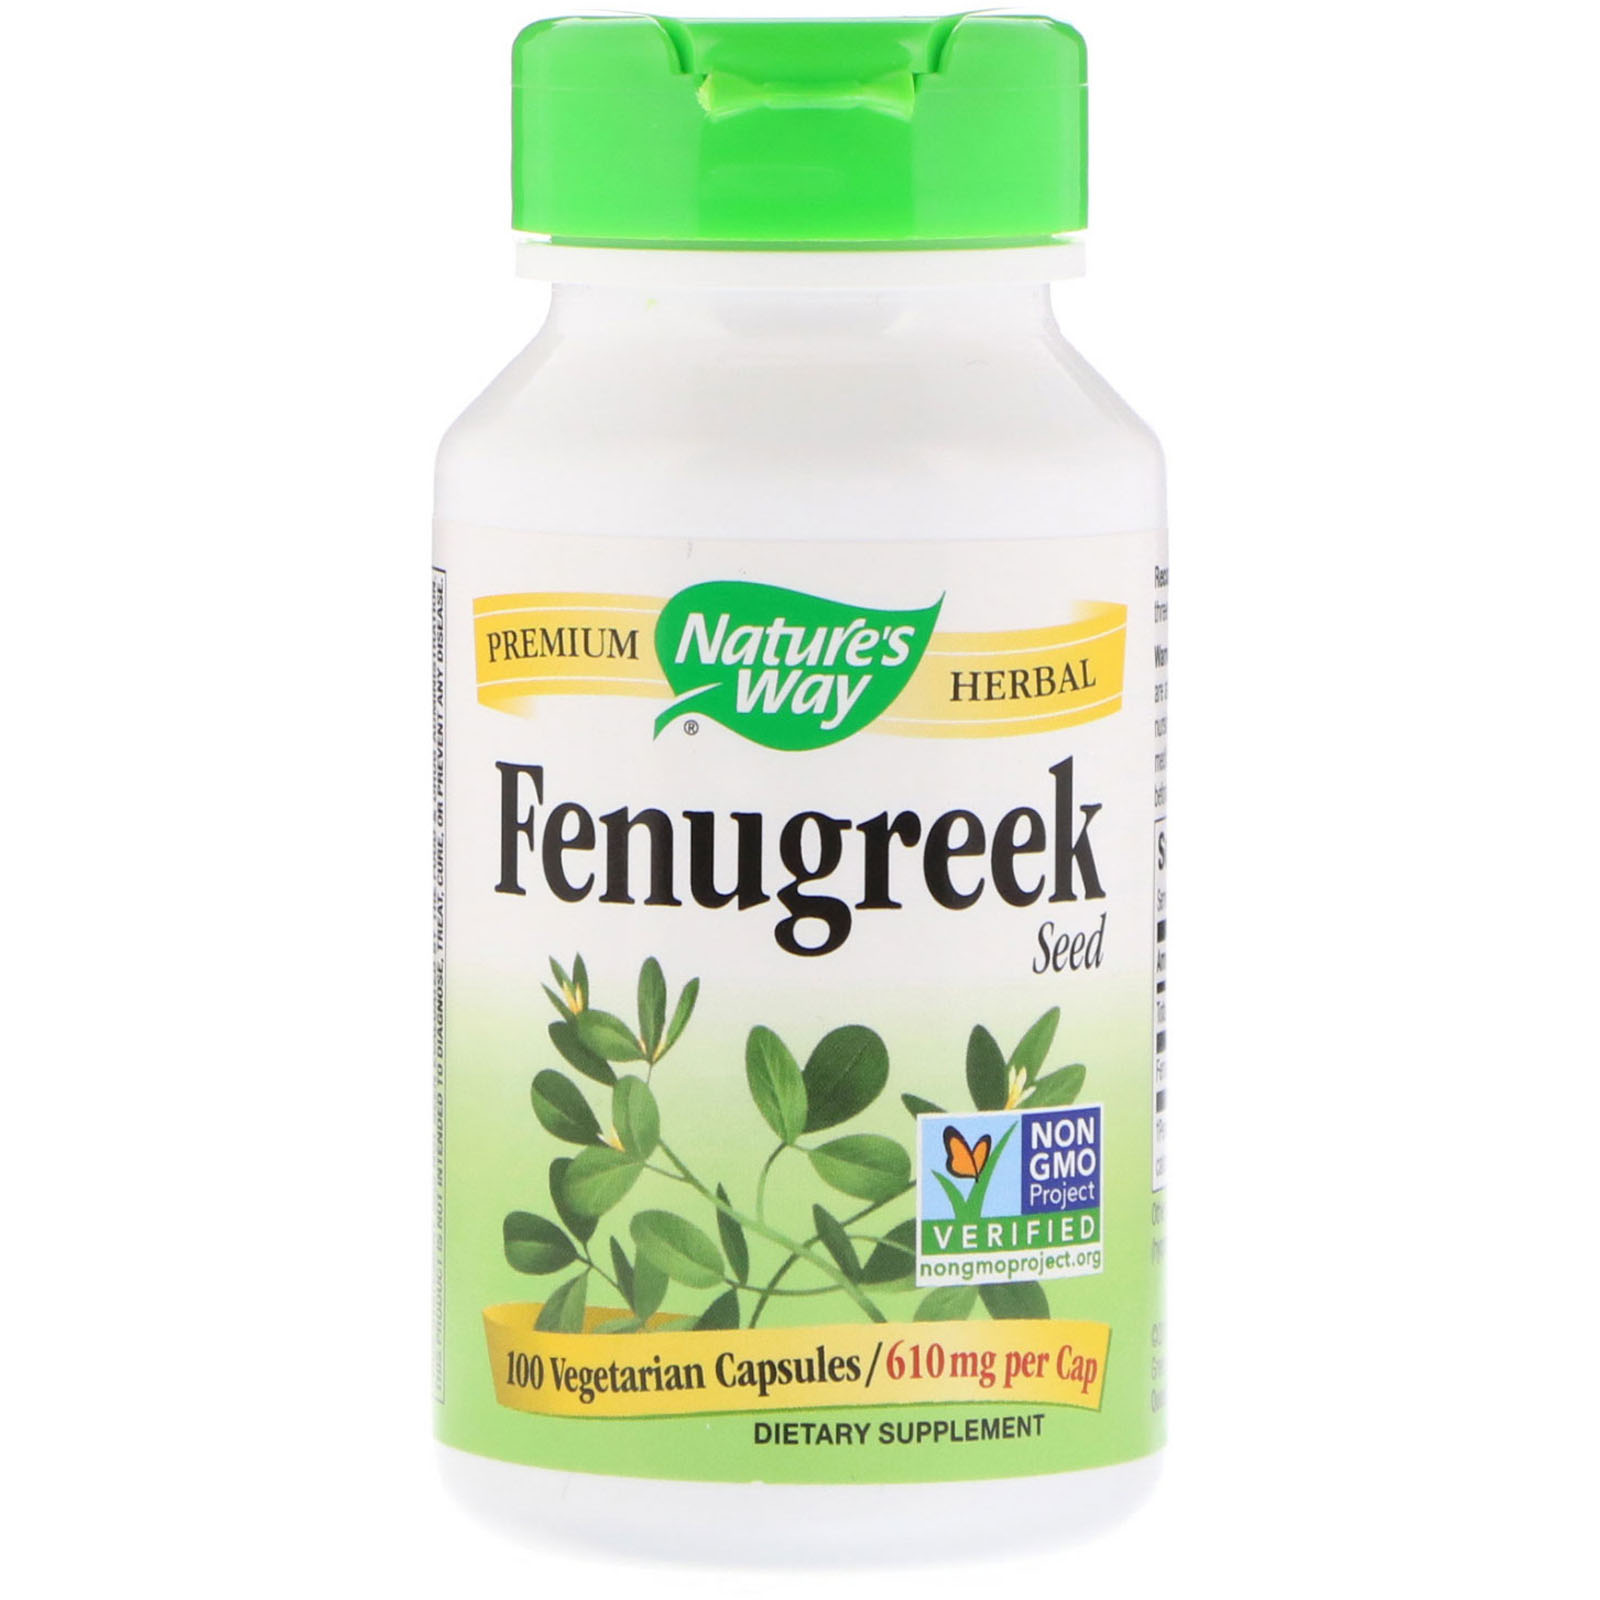 Nature's Way, Fenugreek Seed, 610 mg, 100 Vegetarian Capsules - iHerb.com